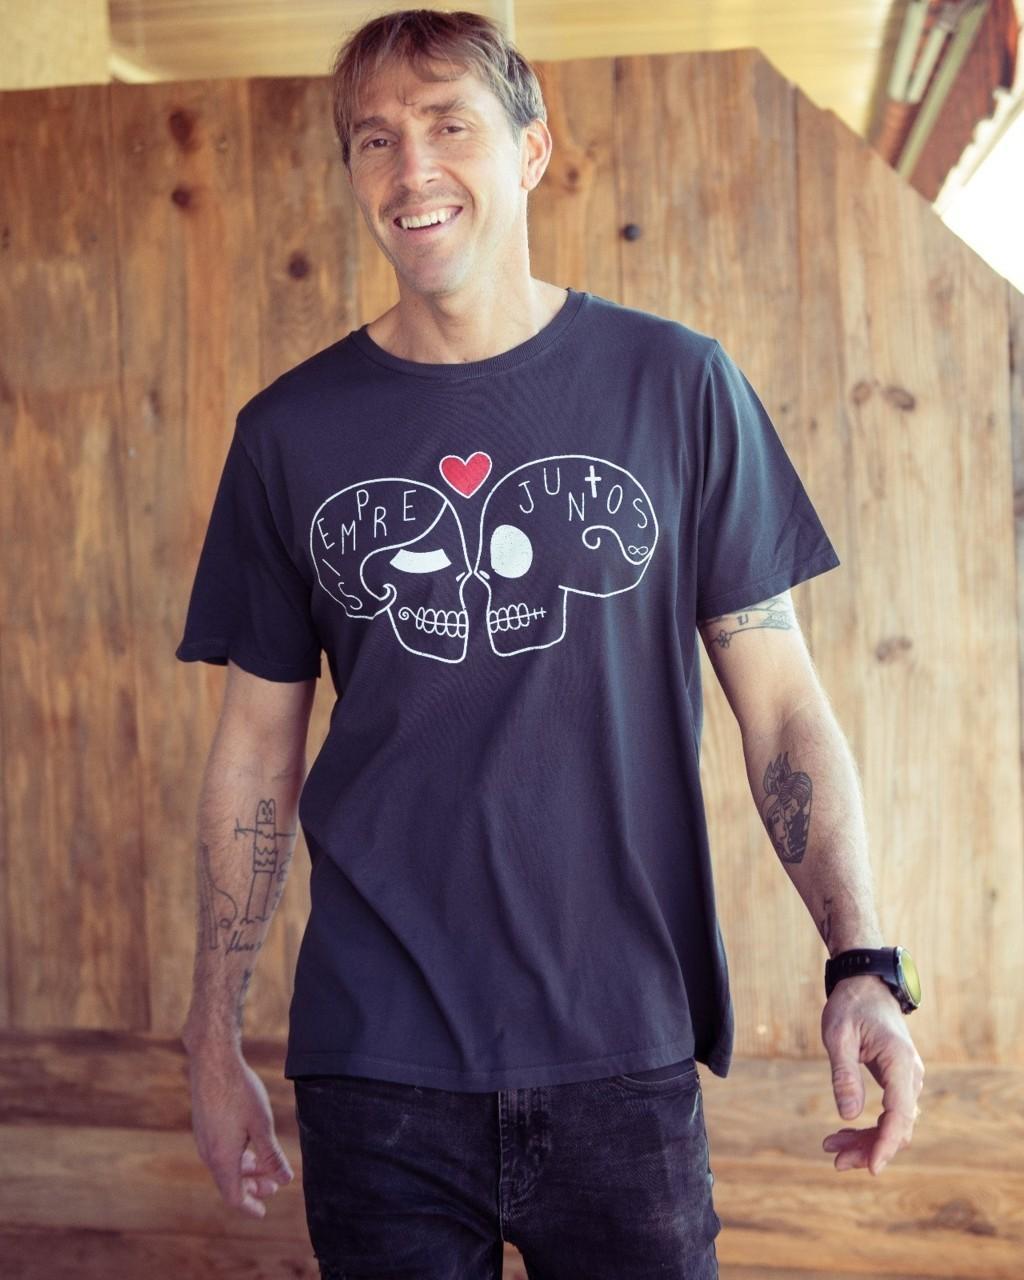 Camiseta con teñido reactivo gris antracita. Diseño acabado vintage